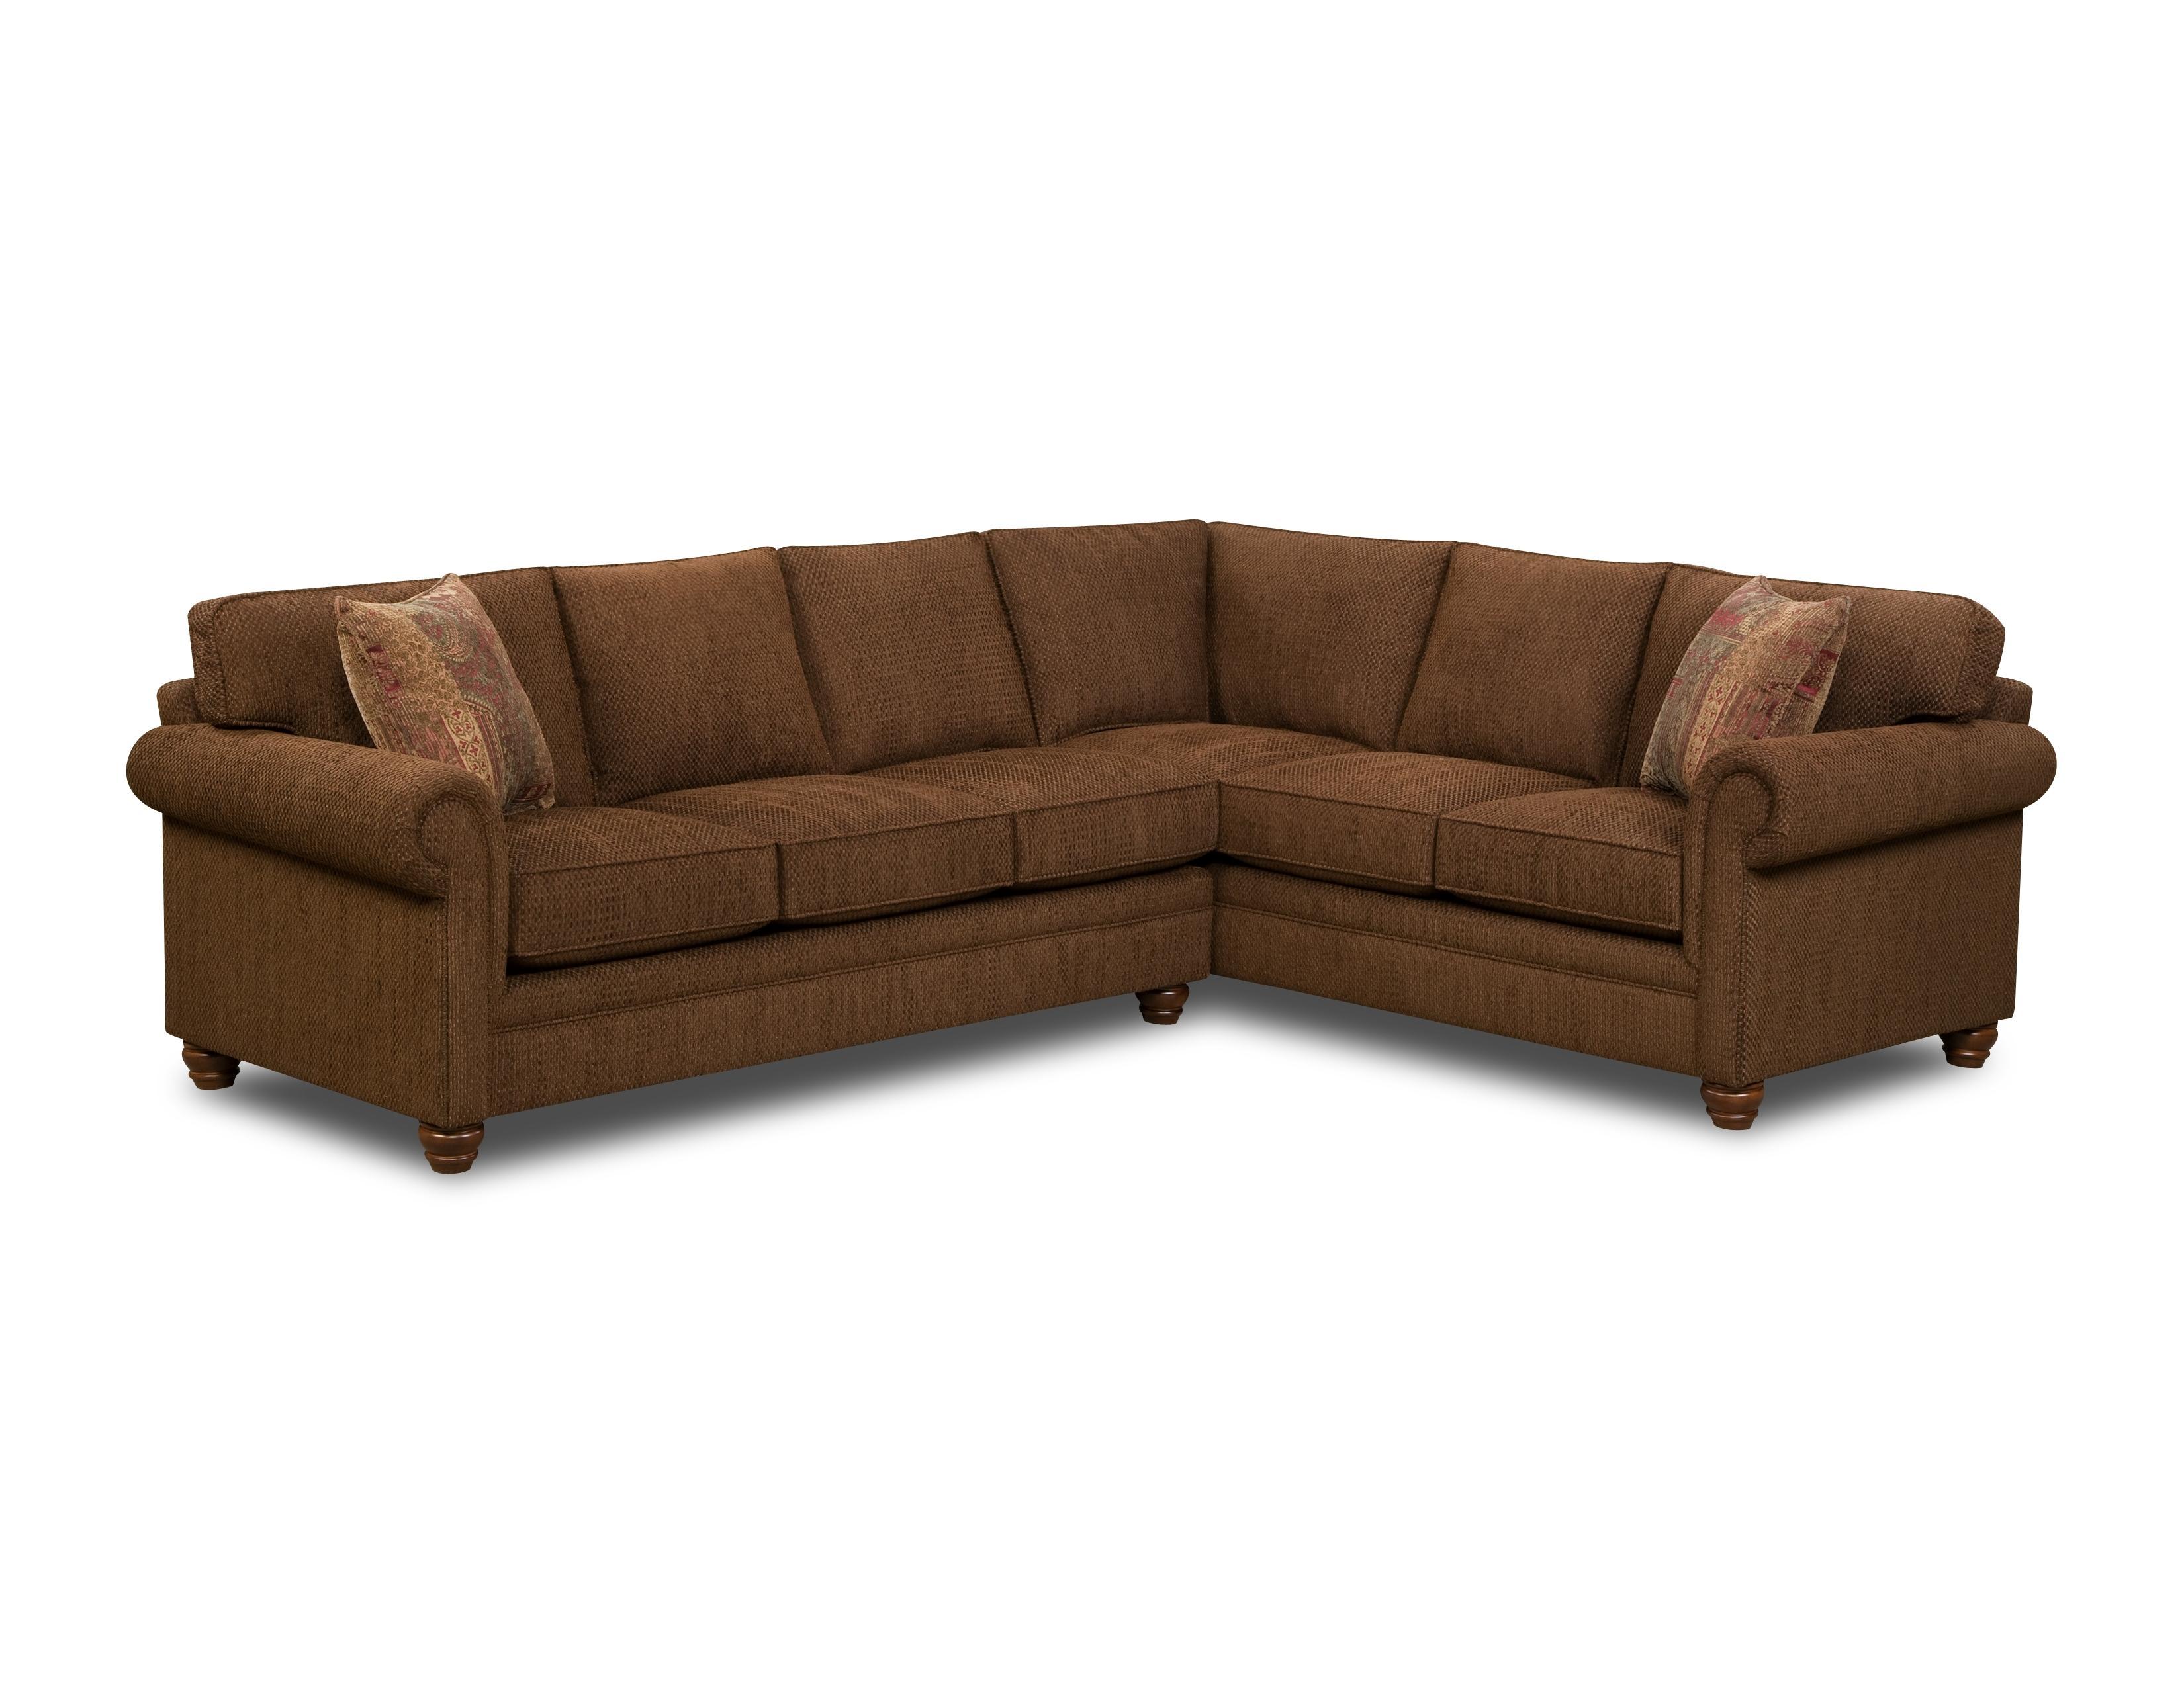 bauhaus sectional sofas refil sofa. Black Bedroom Furniture Sets. Home Design Ideas